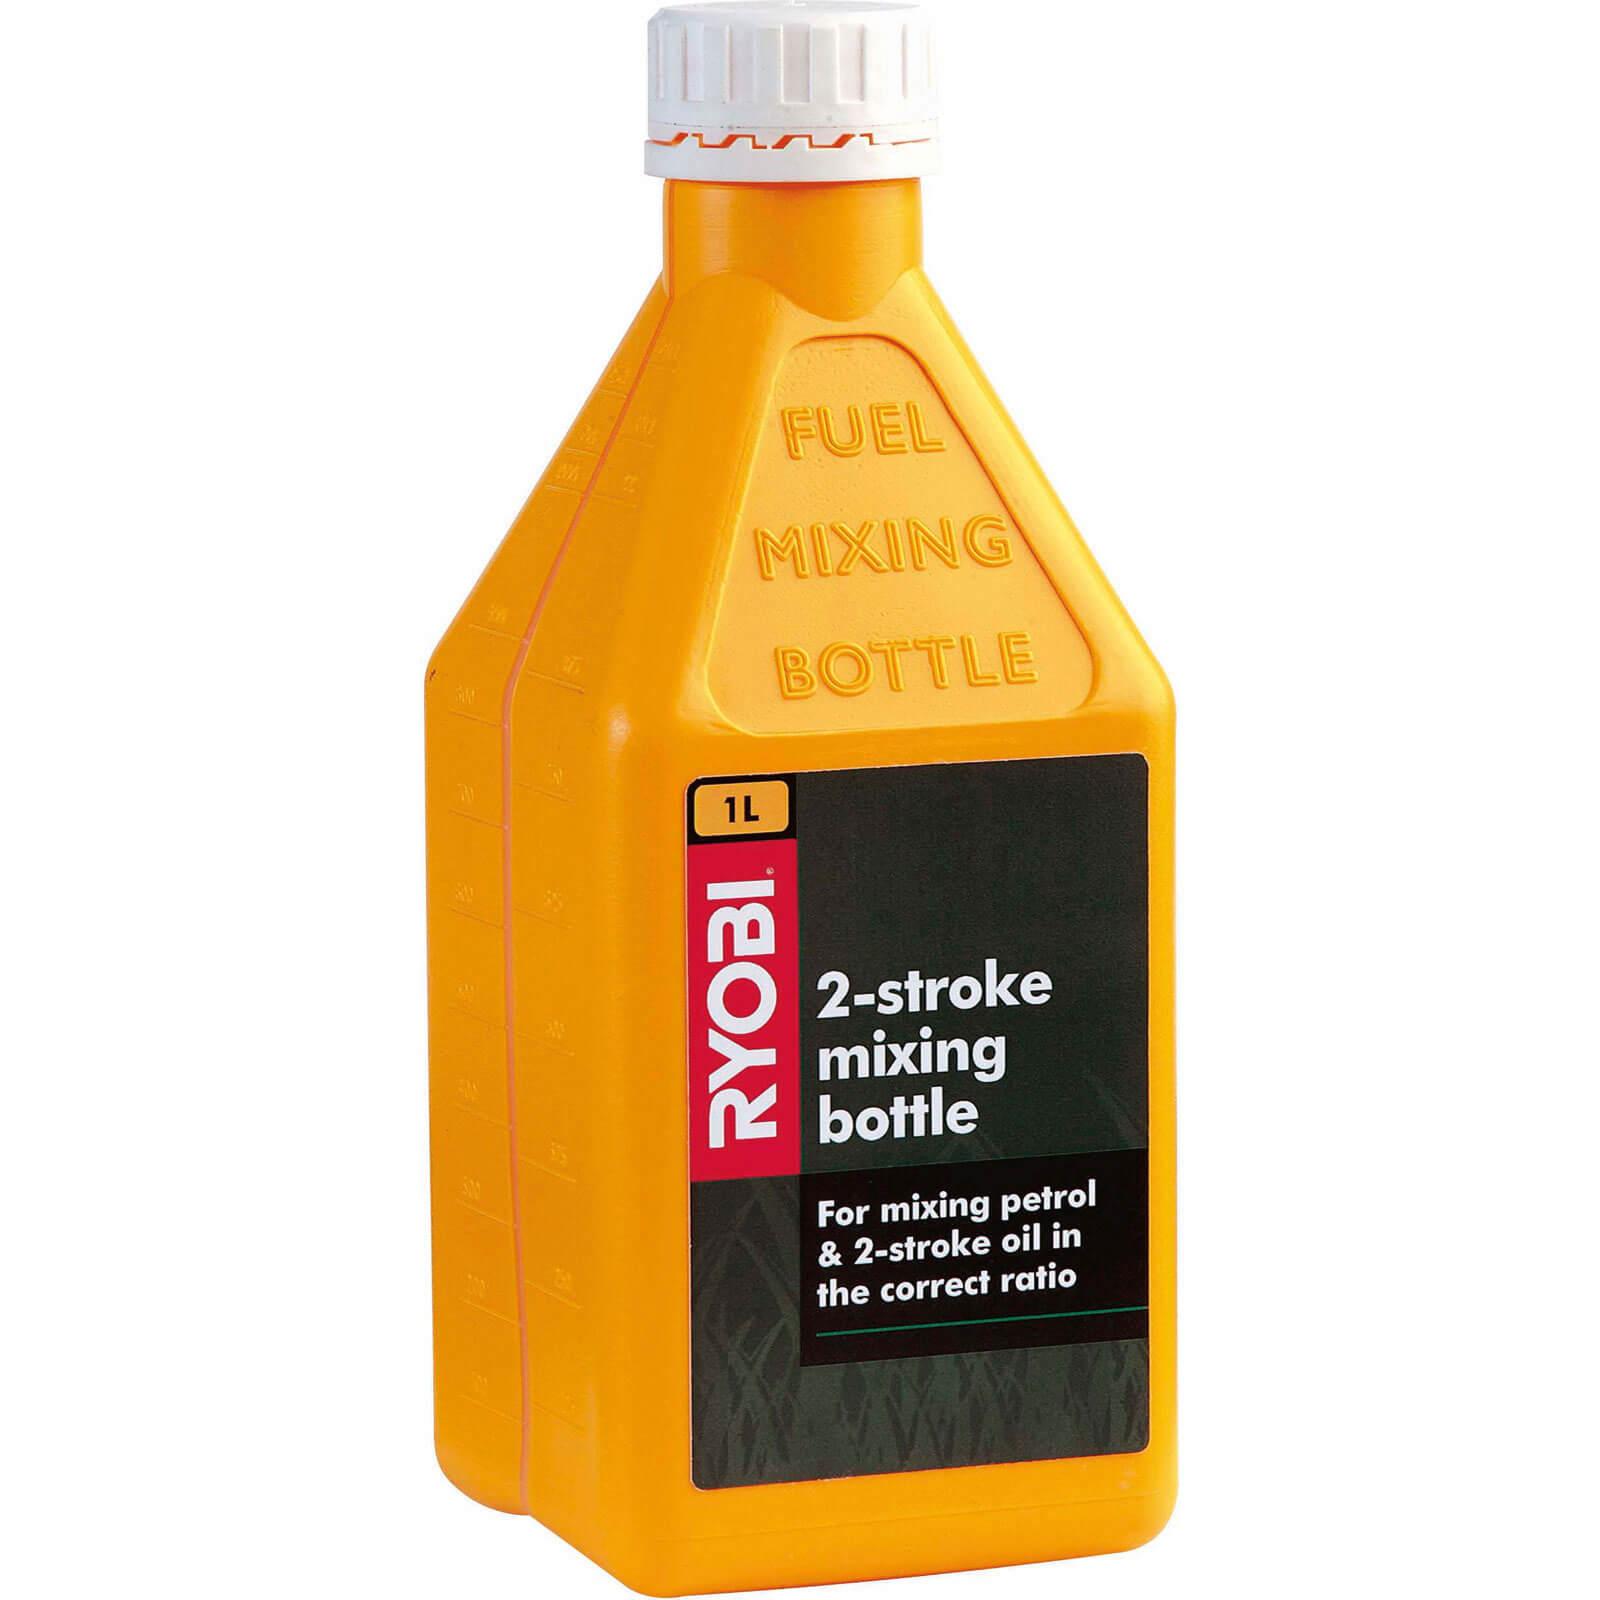 Ryobi RGA001 2 Stroke Petrol / Oil Mixing Bottle